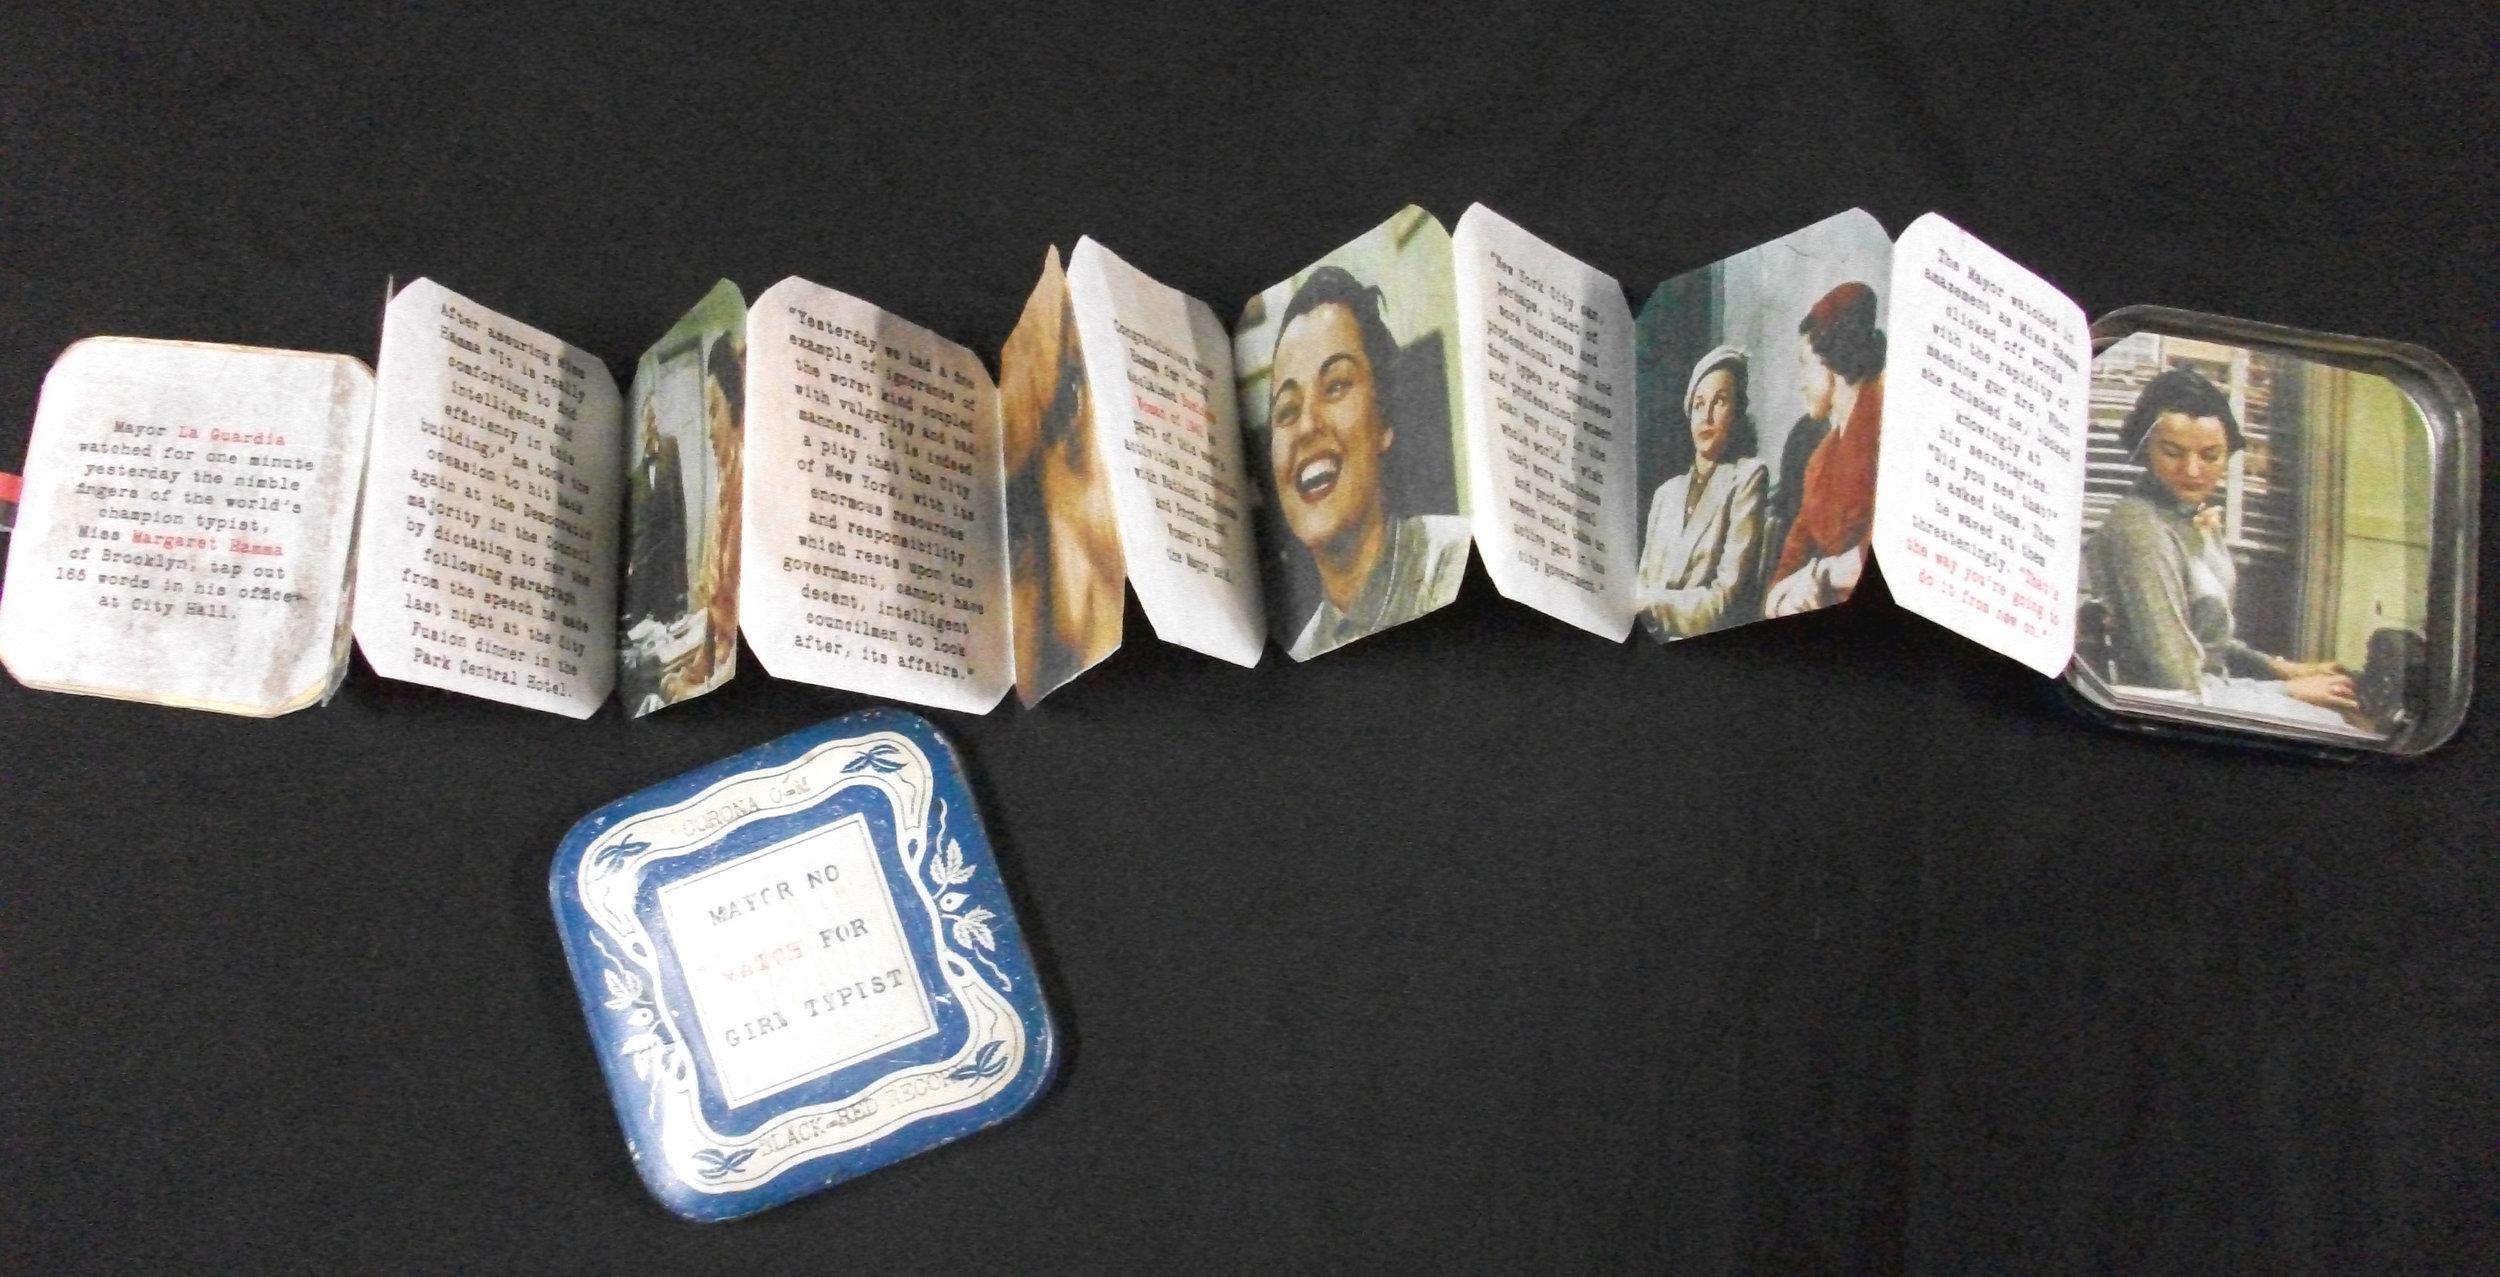 Mayor No Match for Girl Typist, Patricia Sahertian, Mixed Media, Inkjet on Paper, Cardboard, Tin, Arizona, 2011